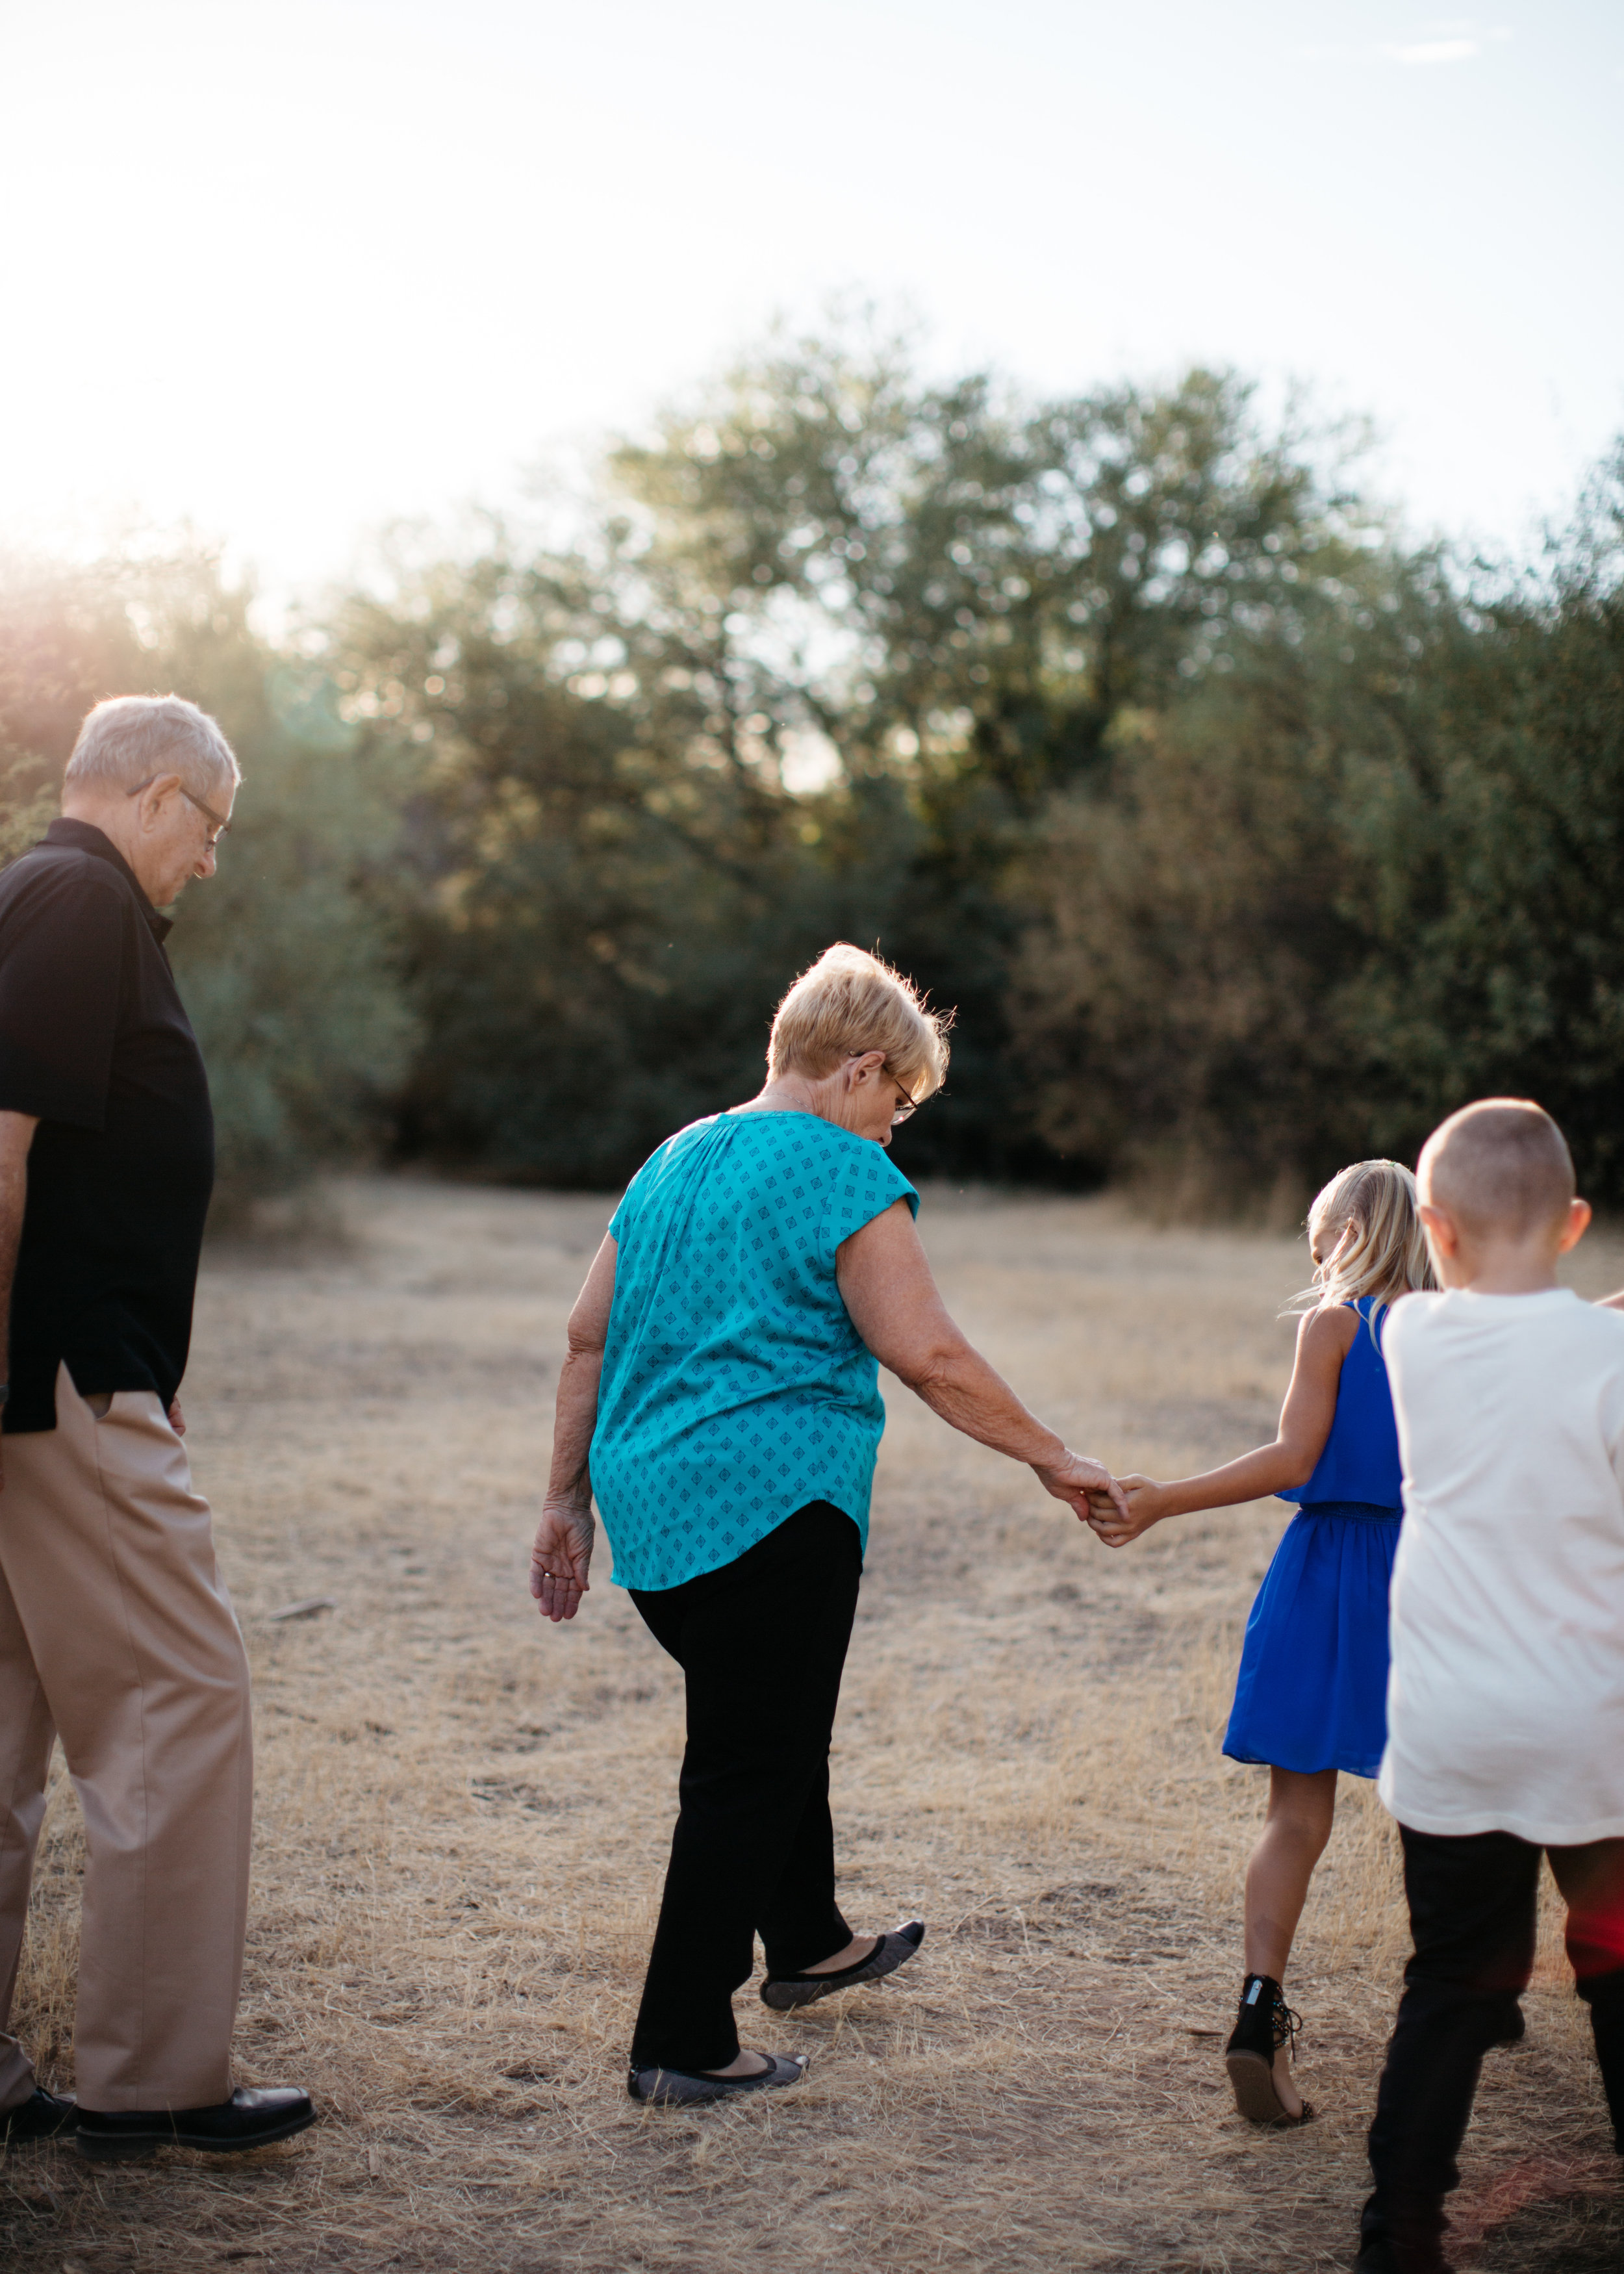 phoenix-family-photography-elan-photographie-studio-6.jpg